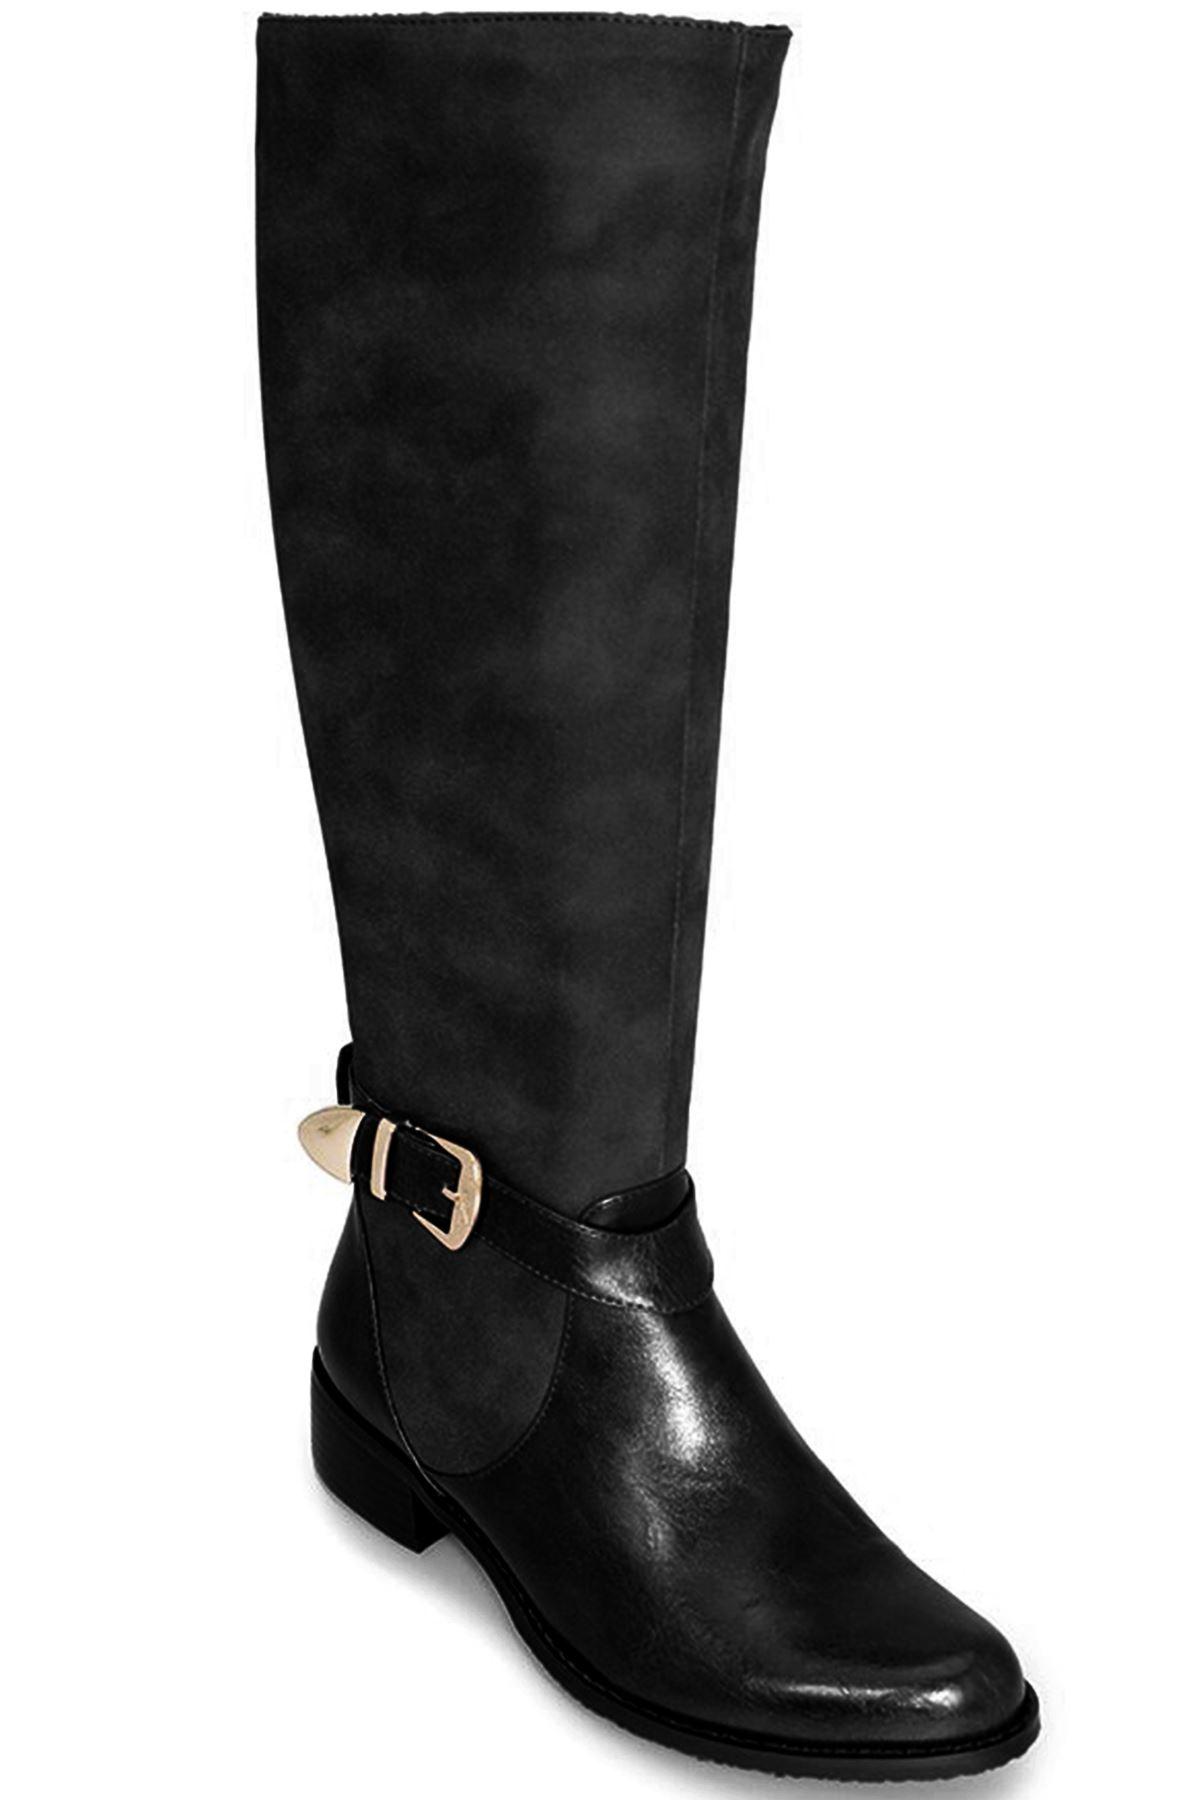 GLC494 Jocelyn Damenschuhe Long Contrast Knee High Riding Style PU Leder Stiefel